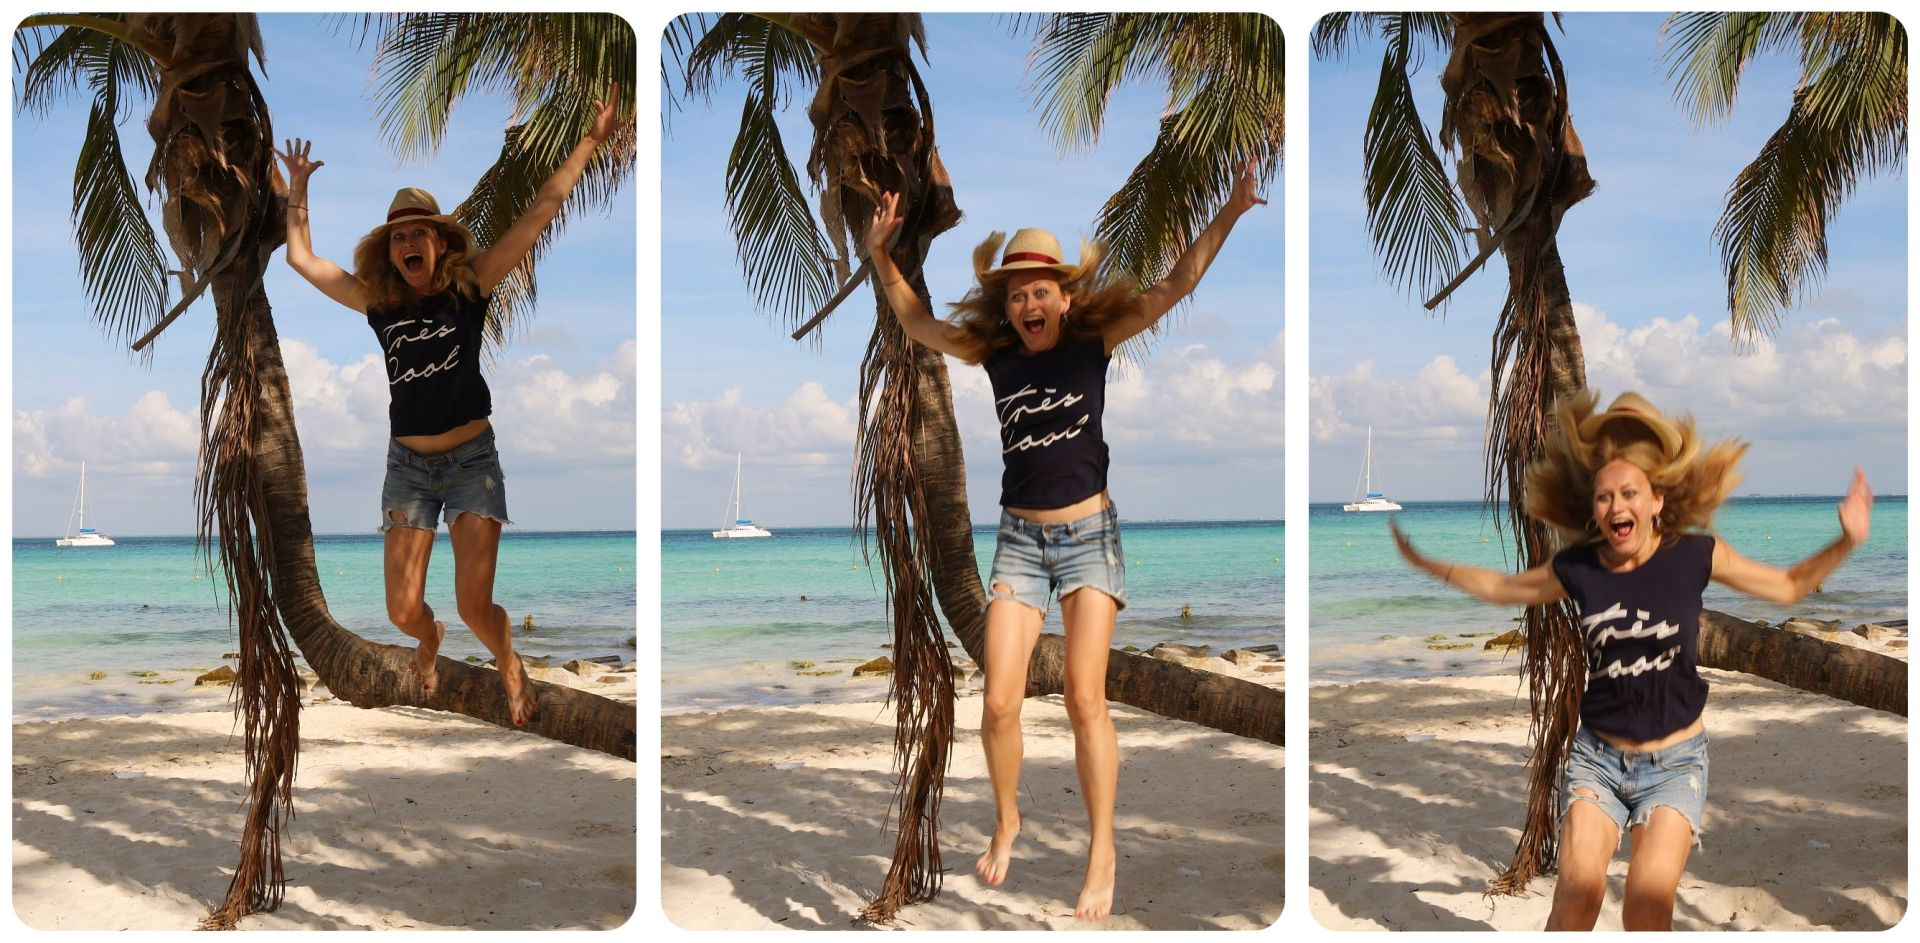 isla mujeres jump